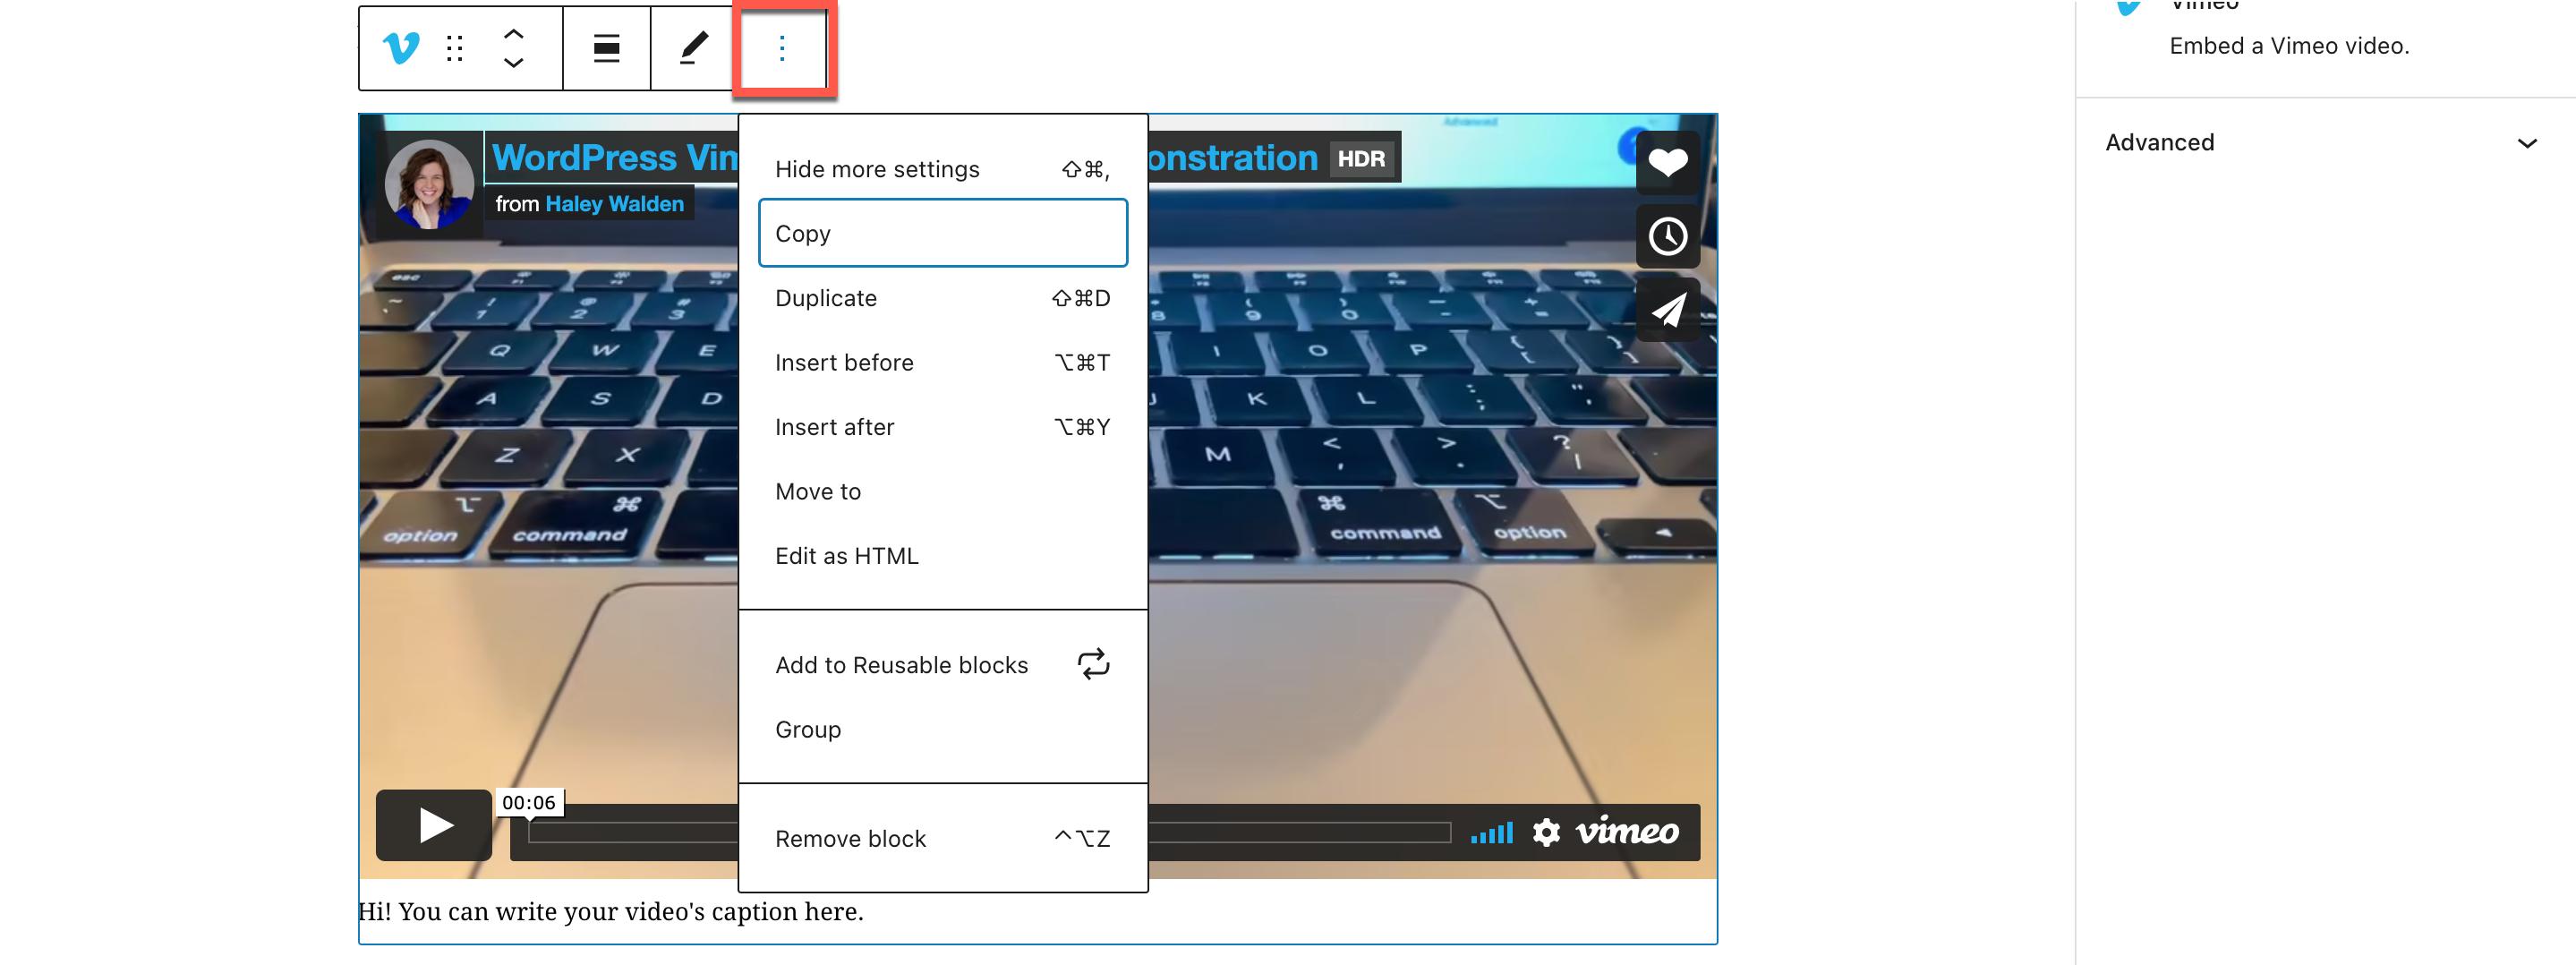 Vimeo嵌入区块更多操作选项